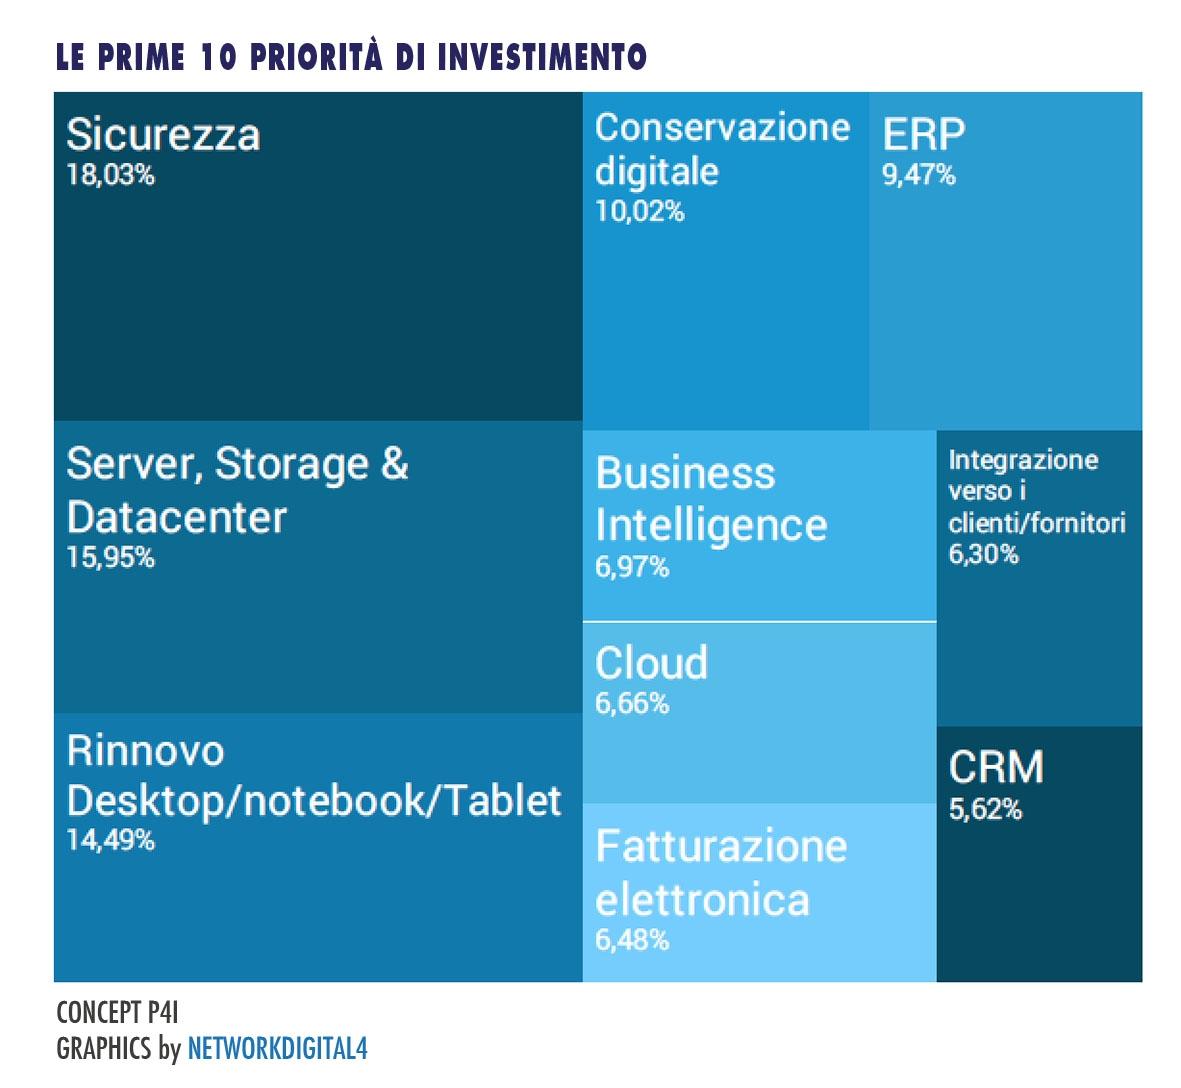 investimenti-budget-ict (2)